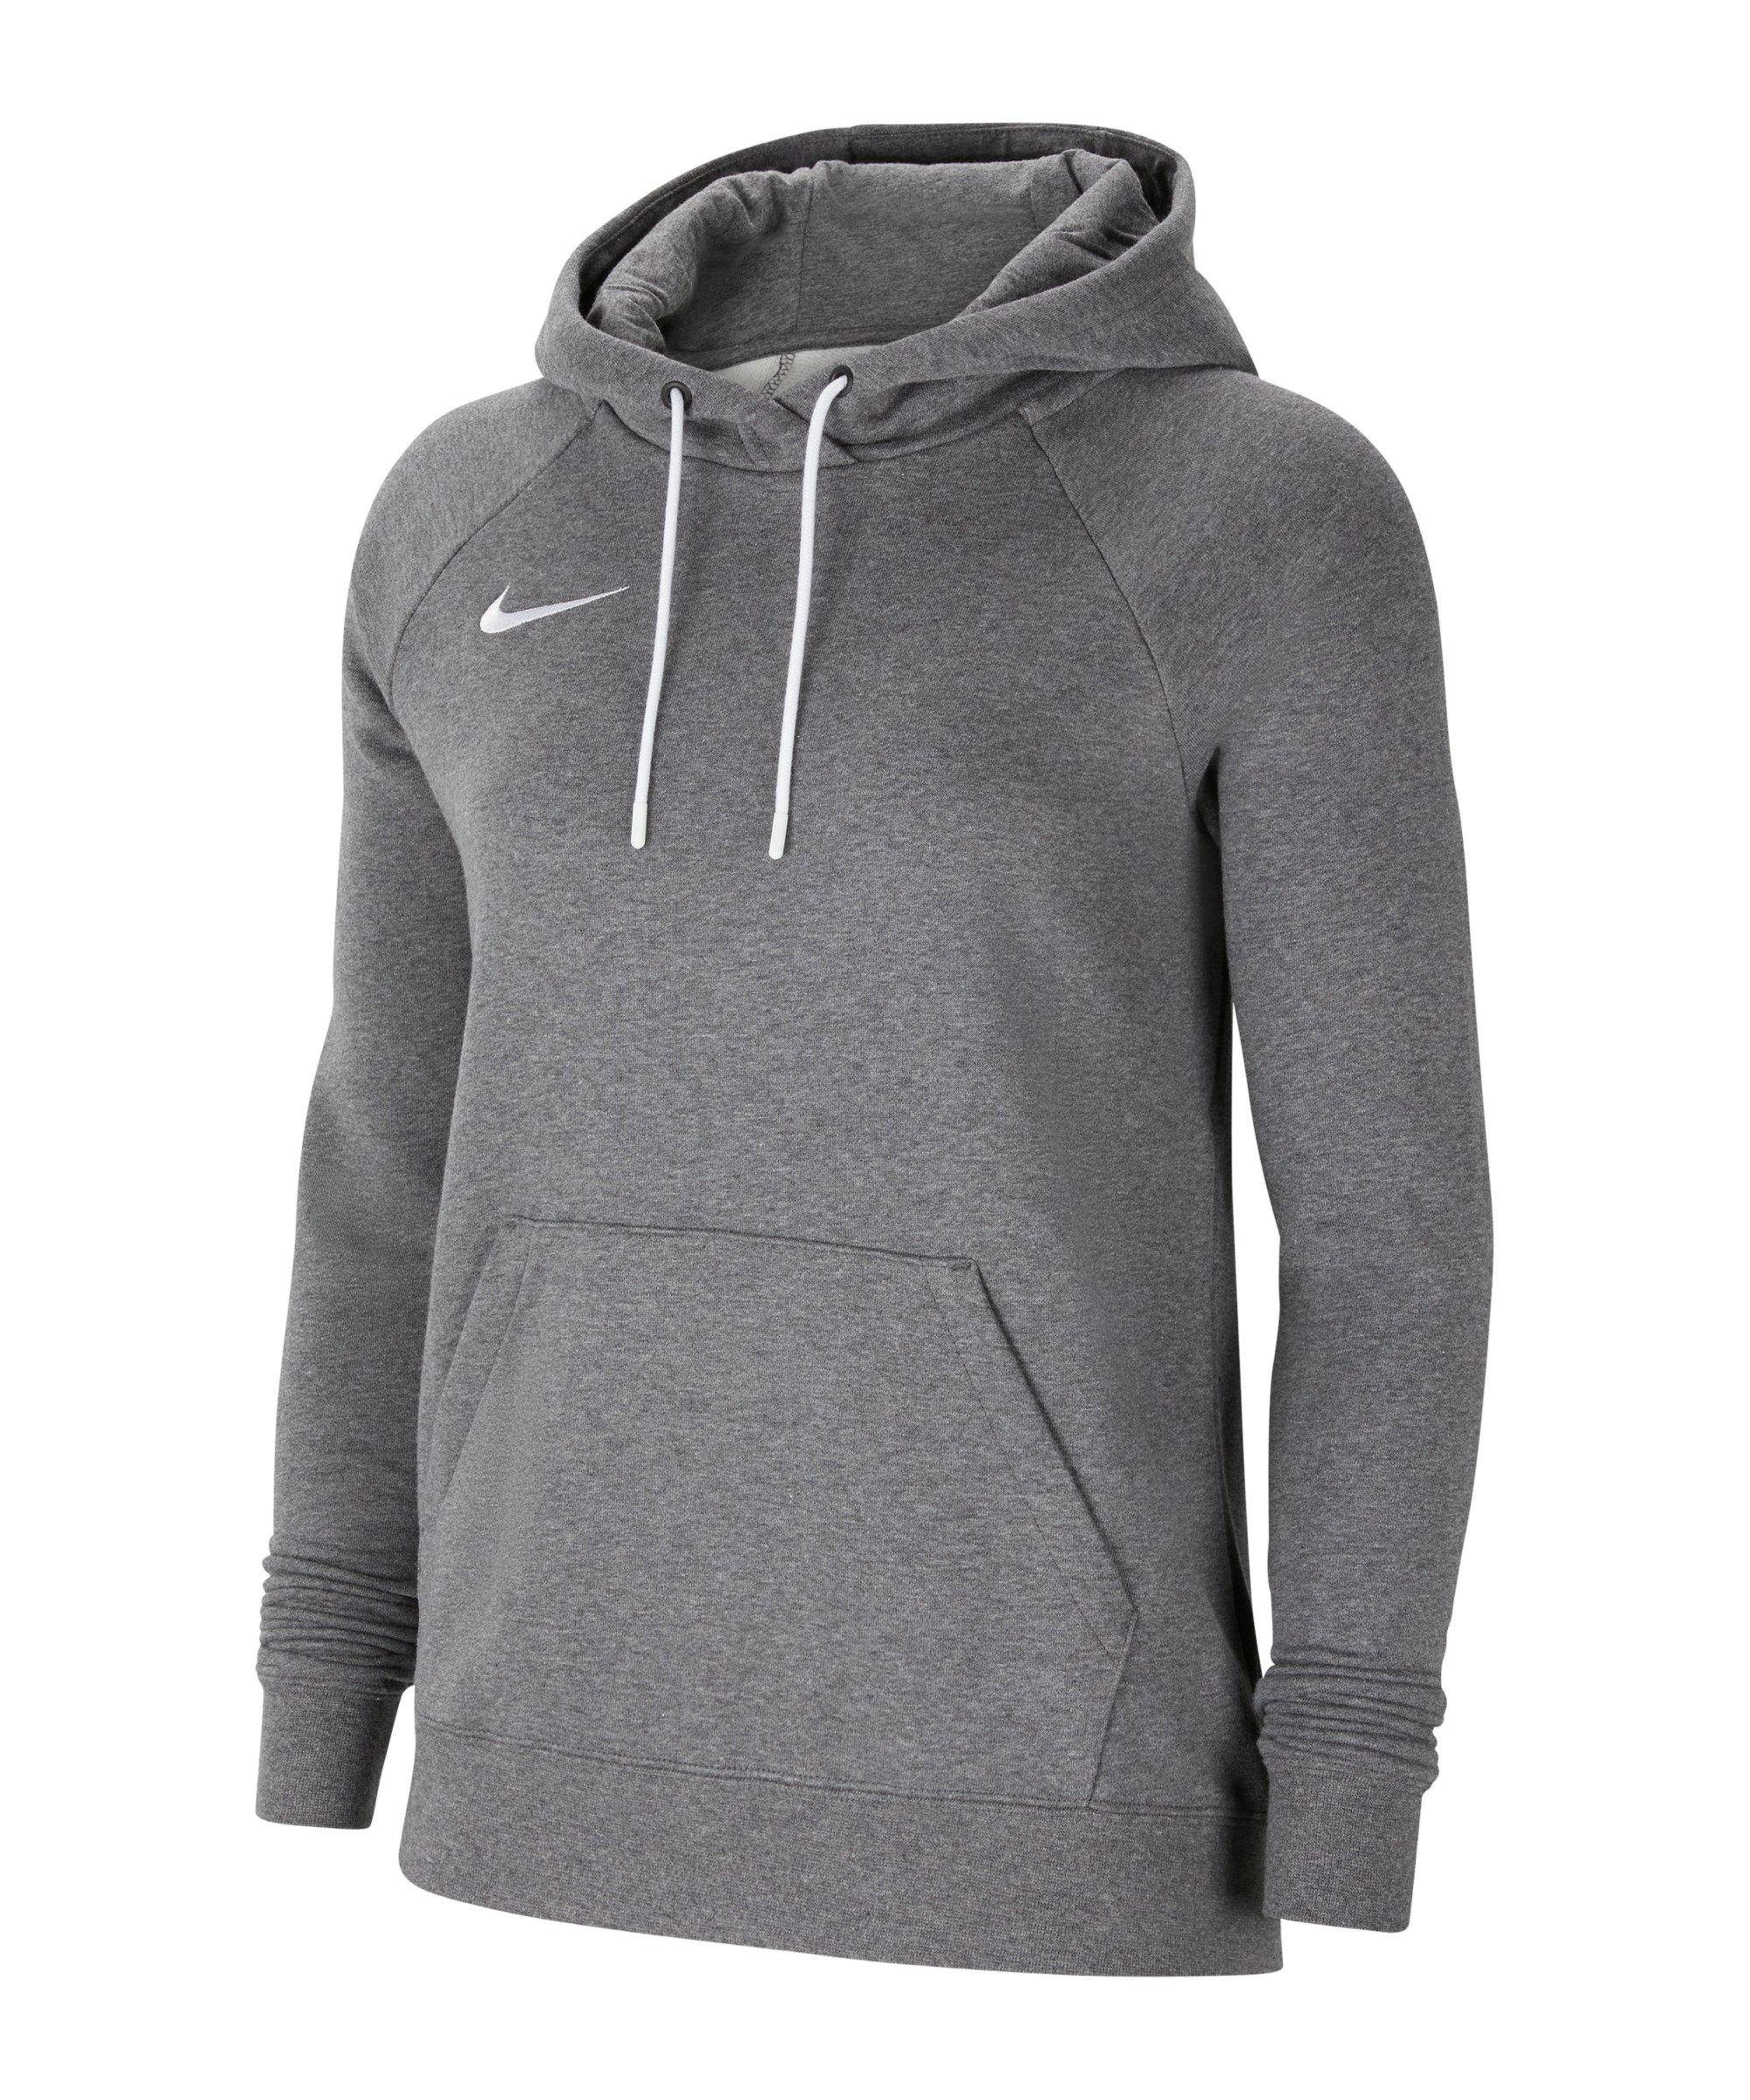 Nike Park 20 Fleece Hoody Damen Grau F071 - grau